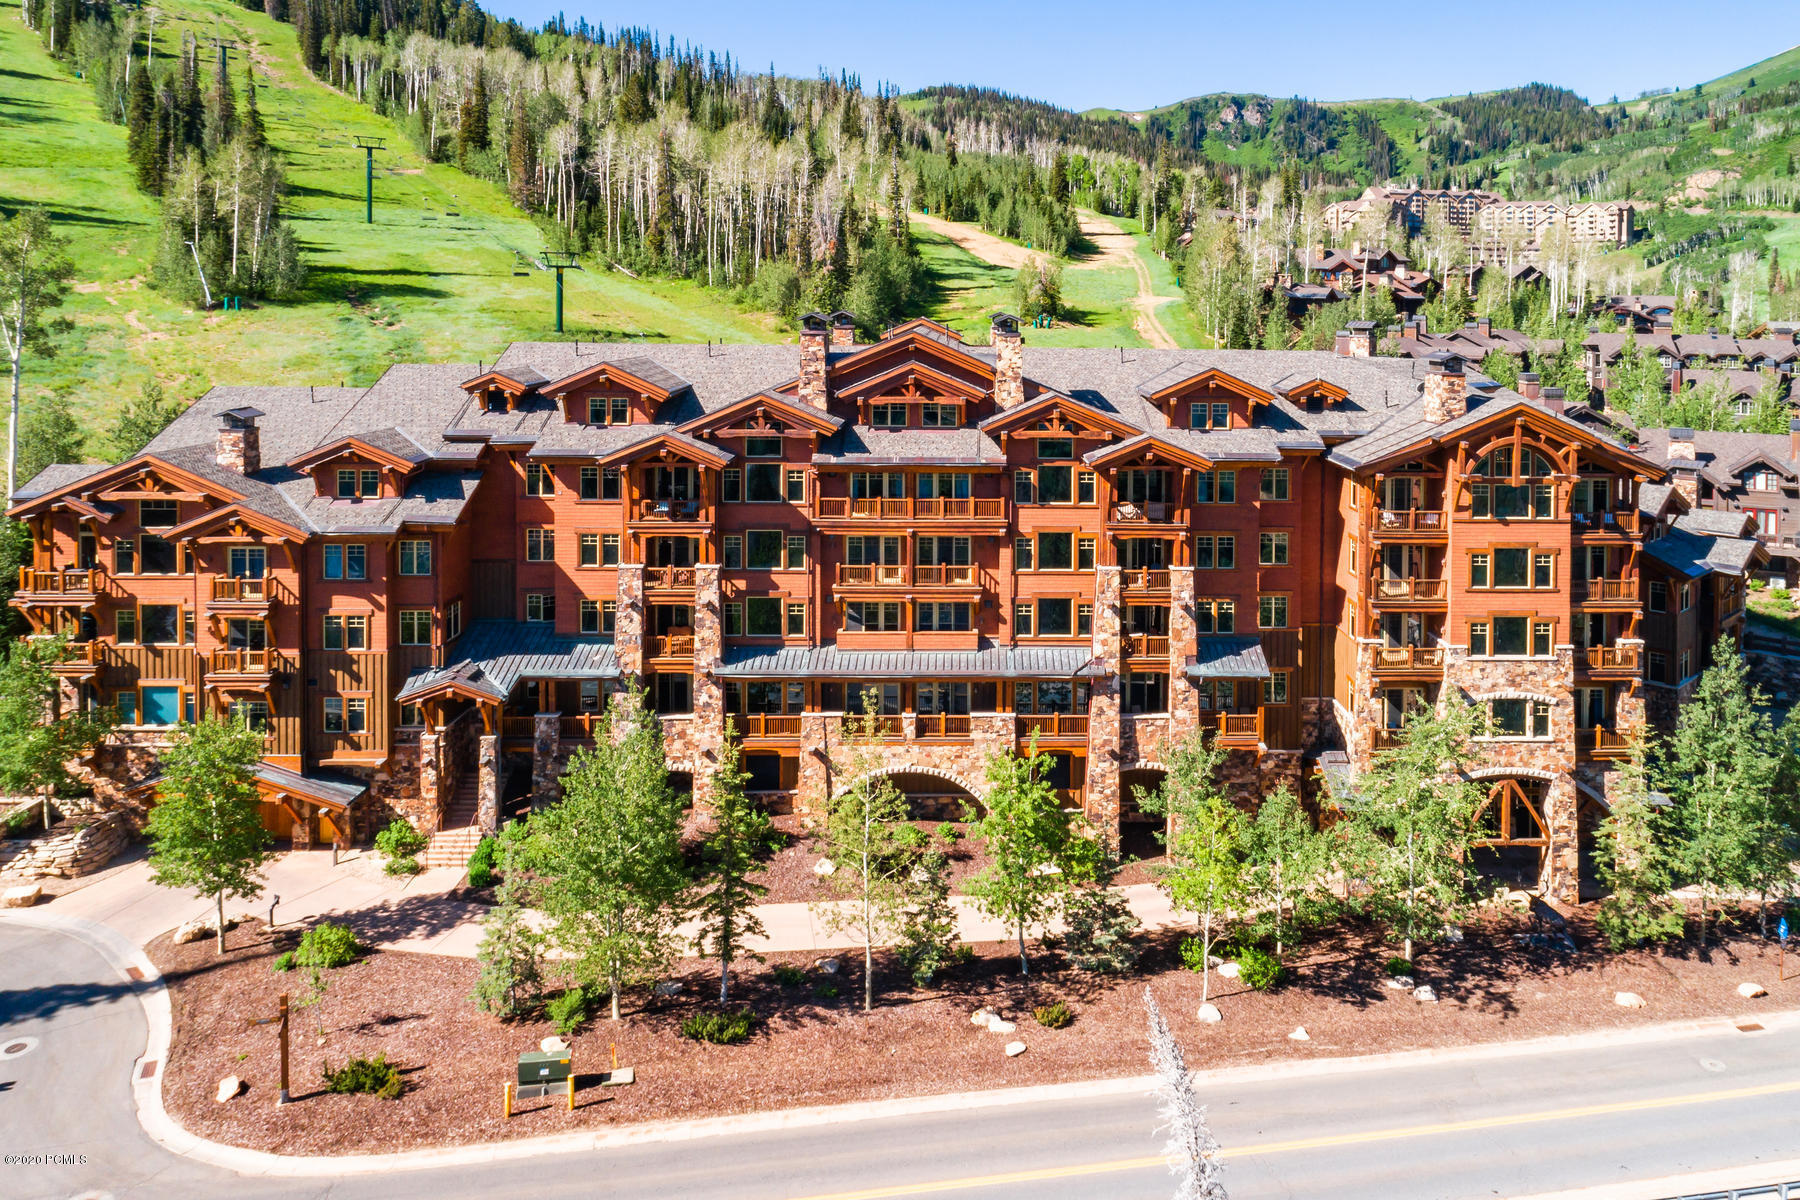 8777 Marsac Avenue, Park City, Utah 84060, 5 Bedrooms Bedrooms, ,6 BathroomsBathrooms,Condominium,For Sale,Marsac,12000284